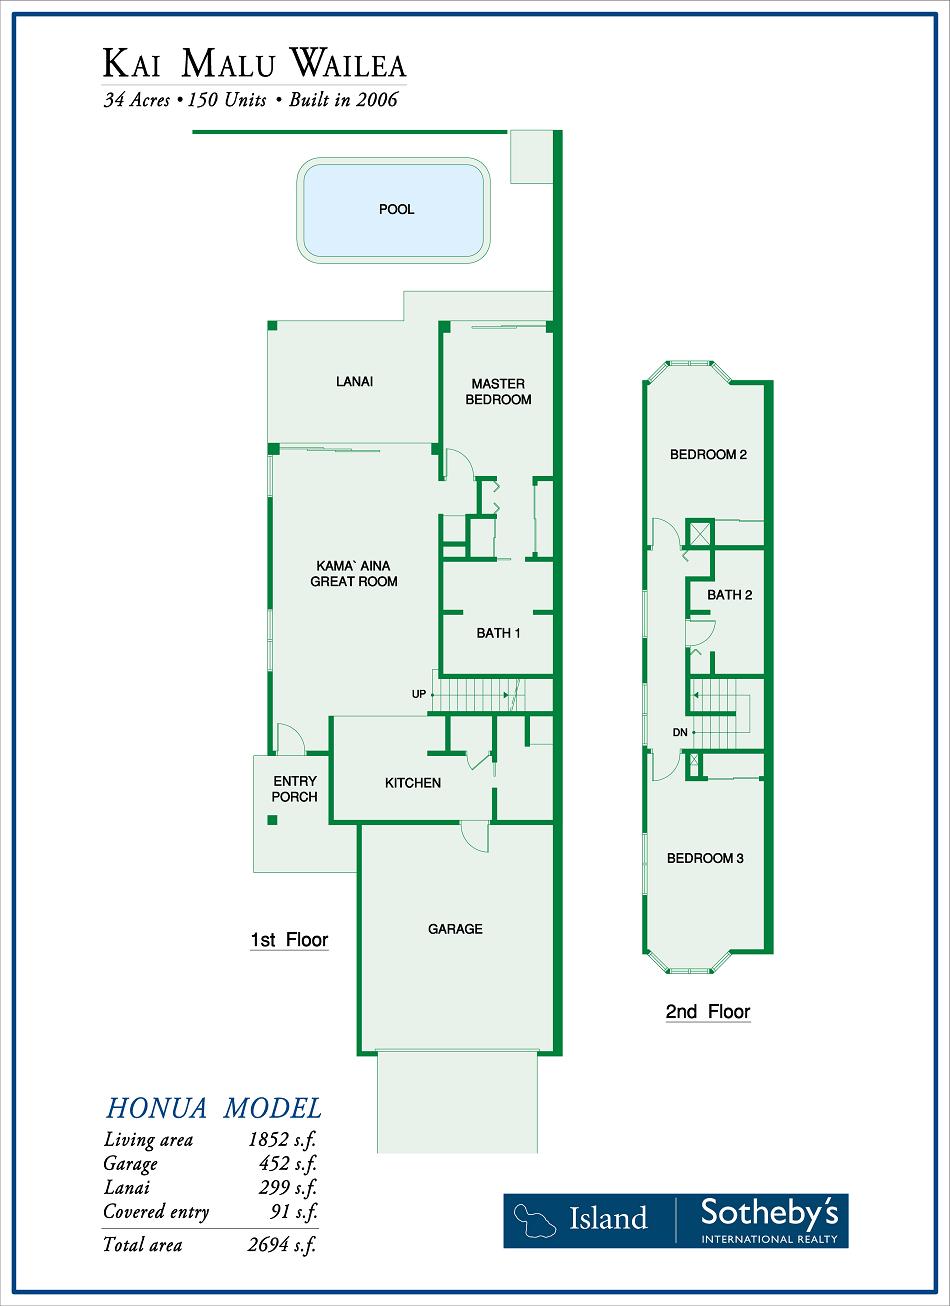 Kai Malu Wailea For Sale 14 Condos Homes Average 1